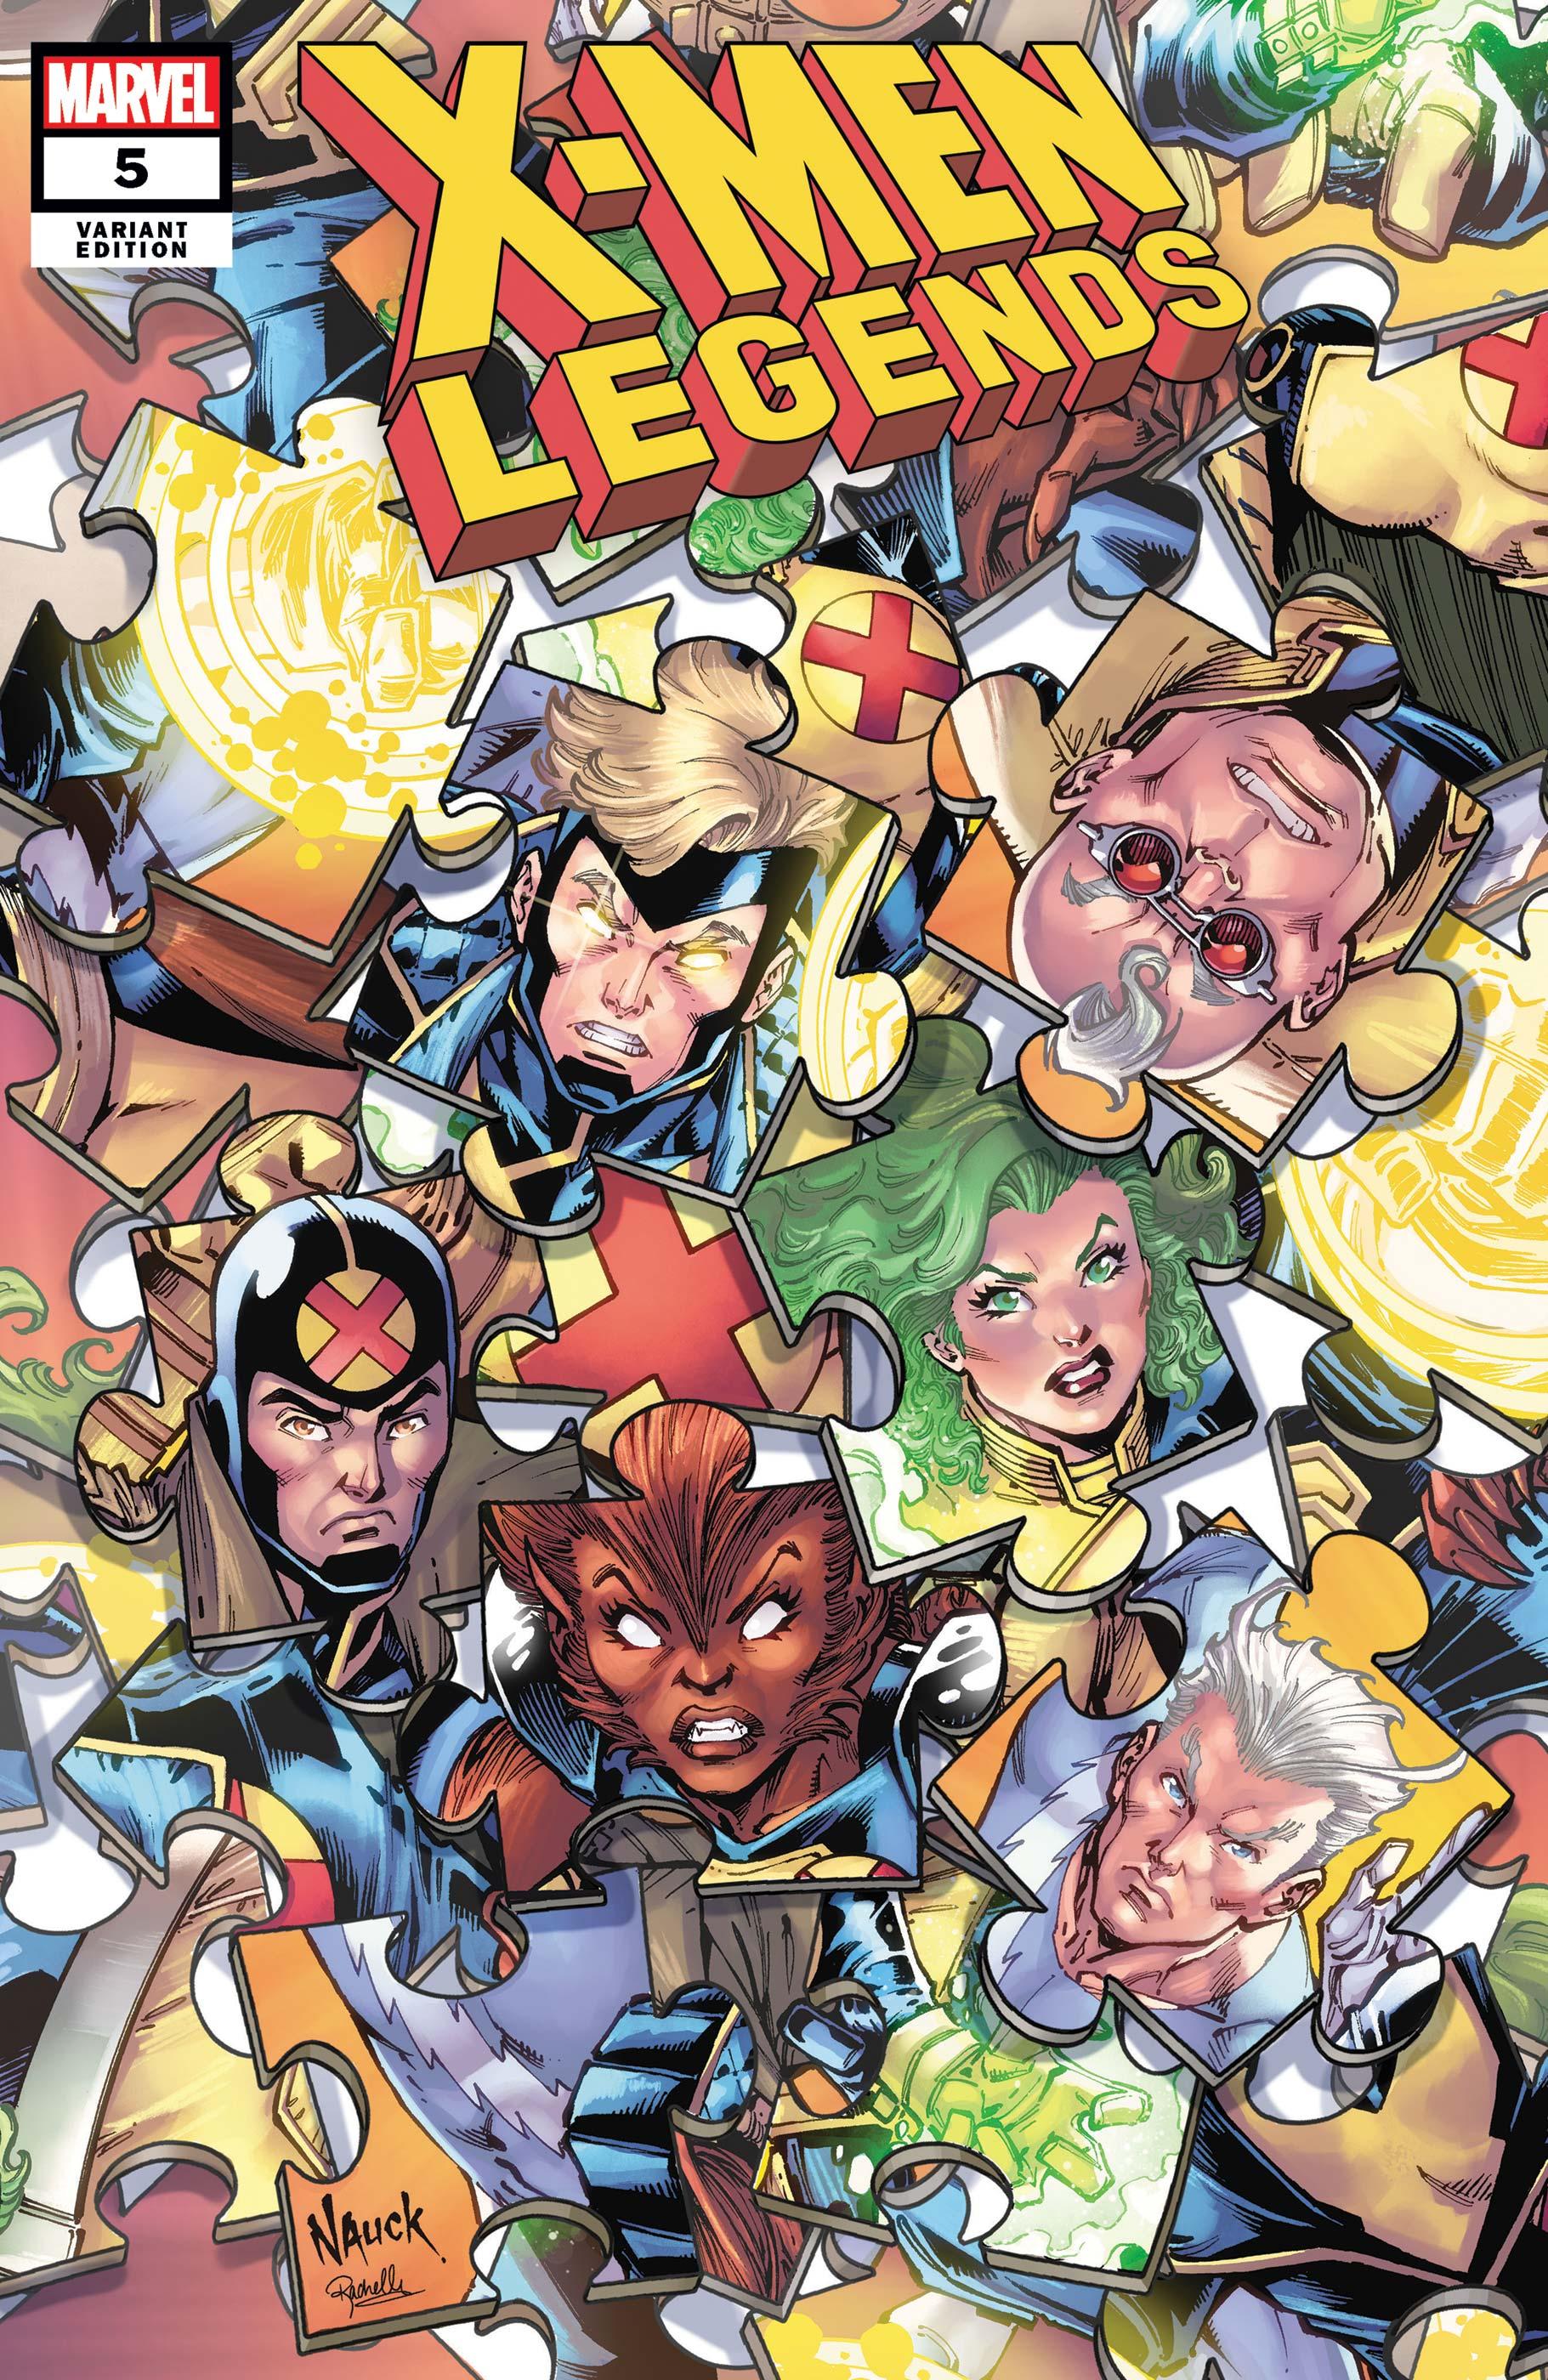 X-Men Legends (2021) #5 (Variant)